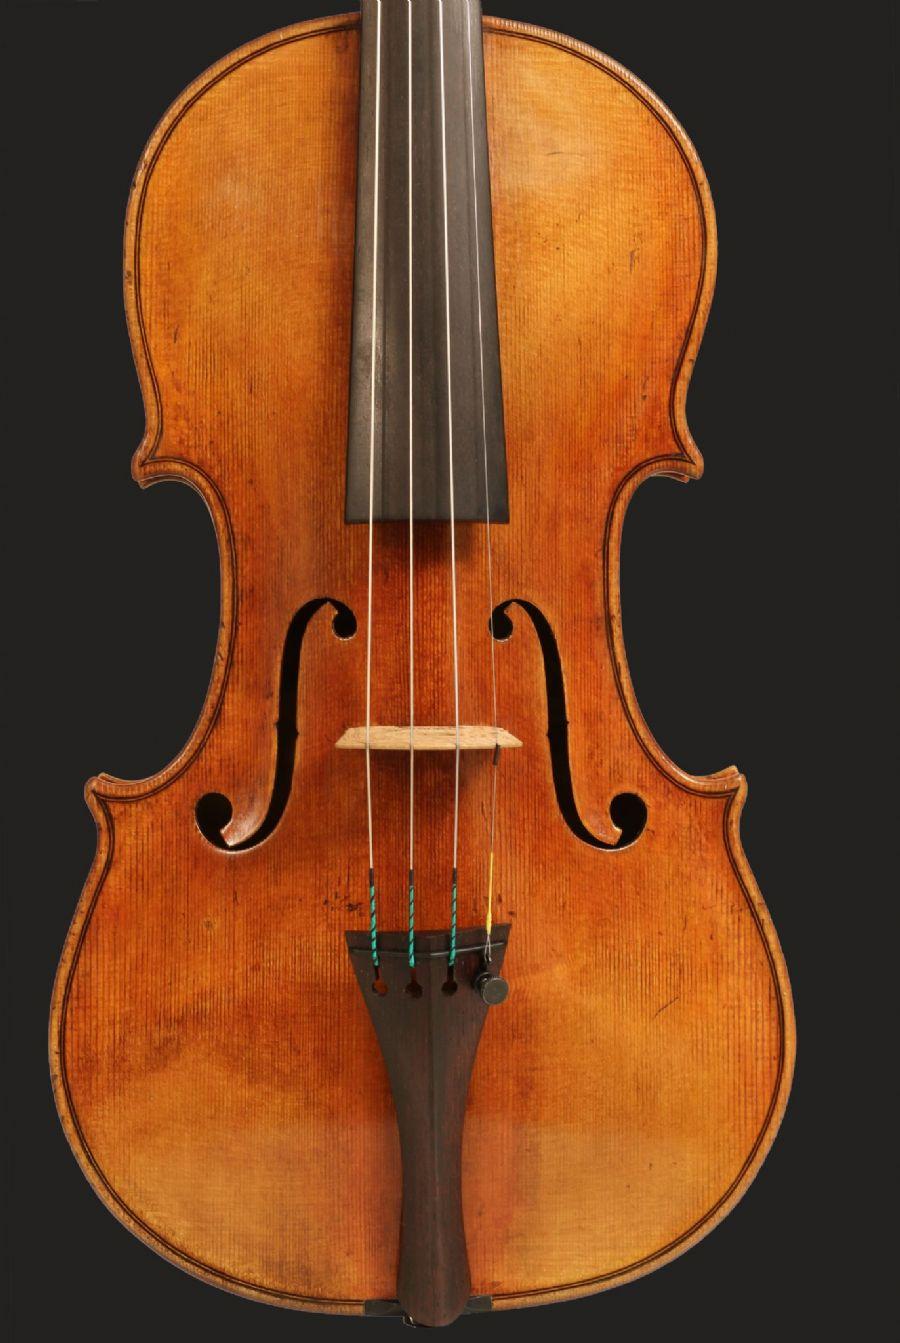 a-violin-by-roger-hansell-after-joseph-filius-andrea-guarneri-2017-1779-p[ekm]900x1343[ekm].jpg